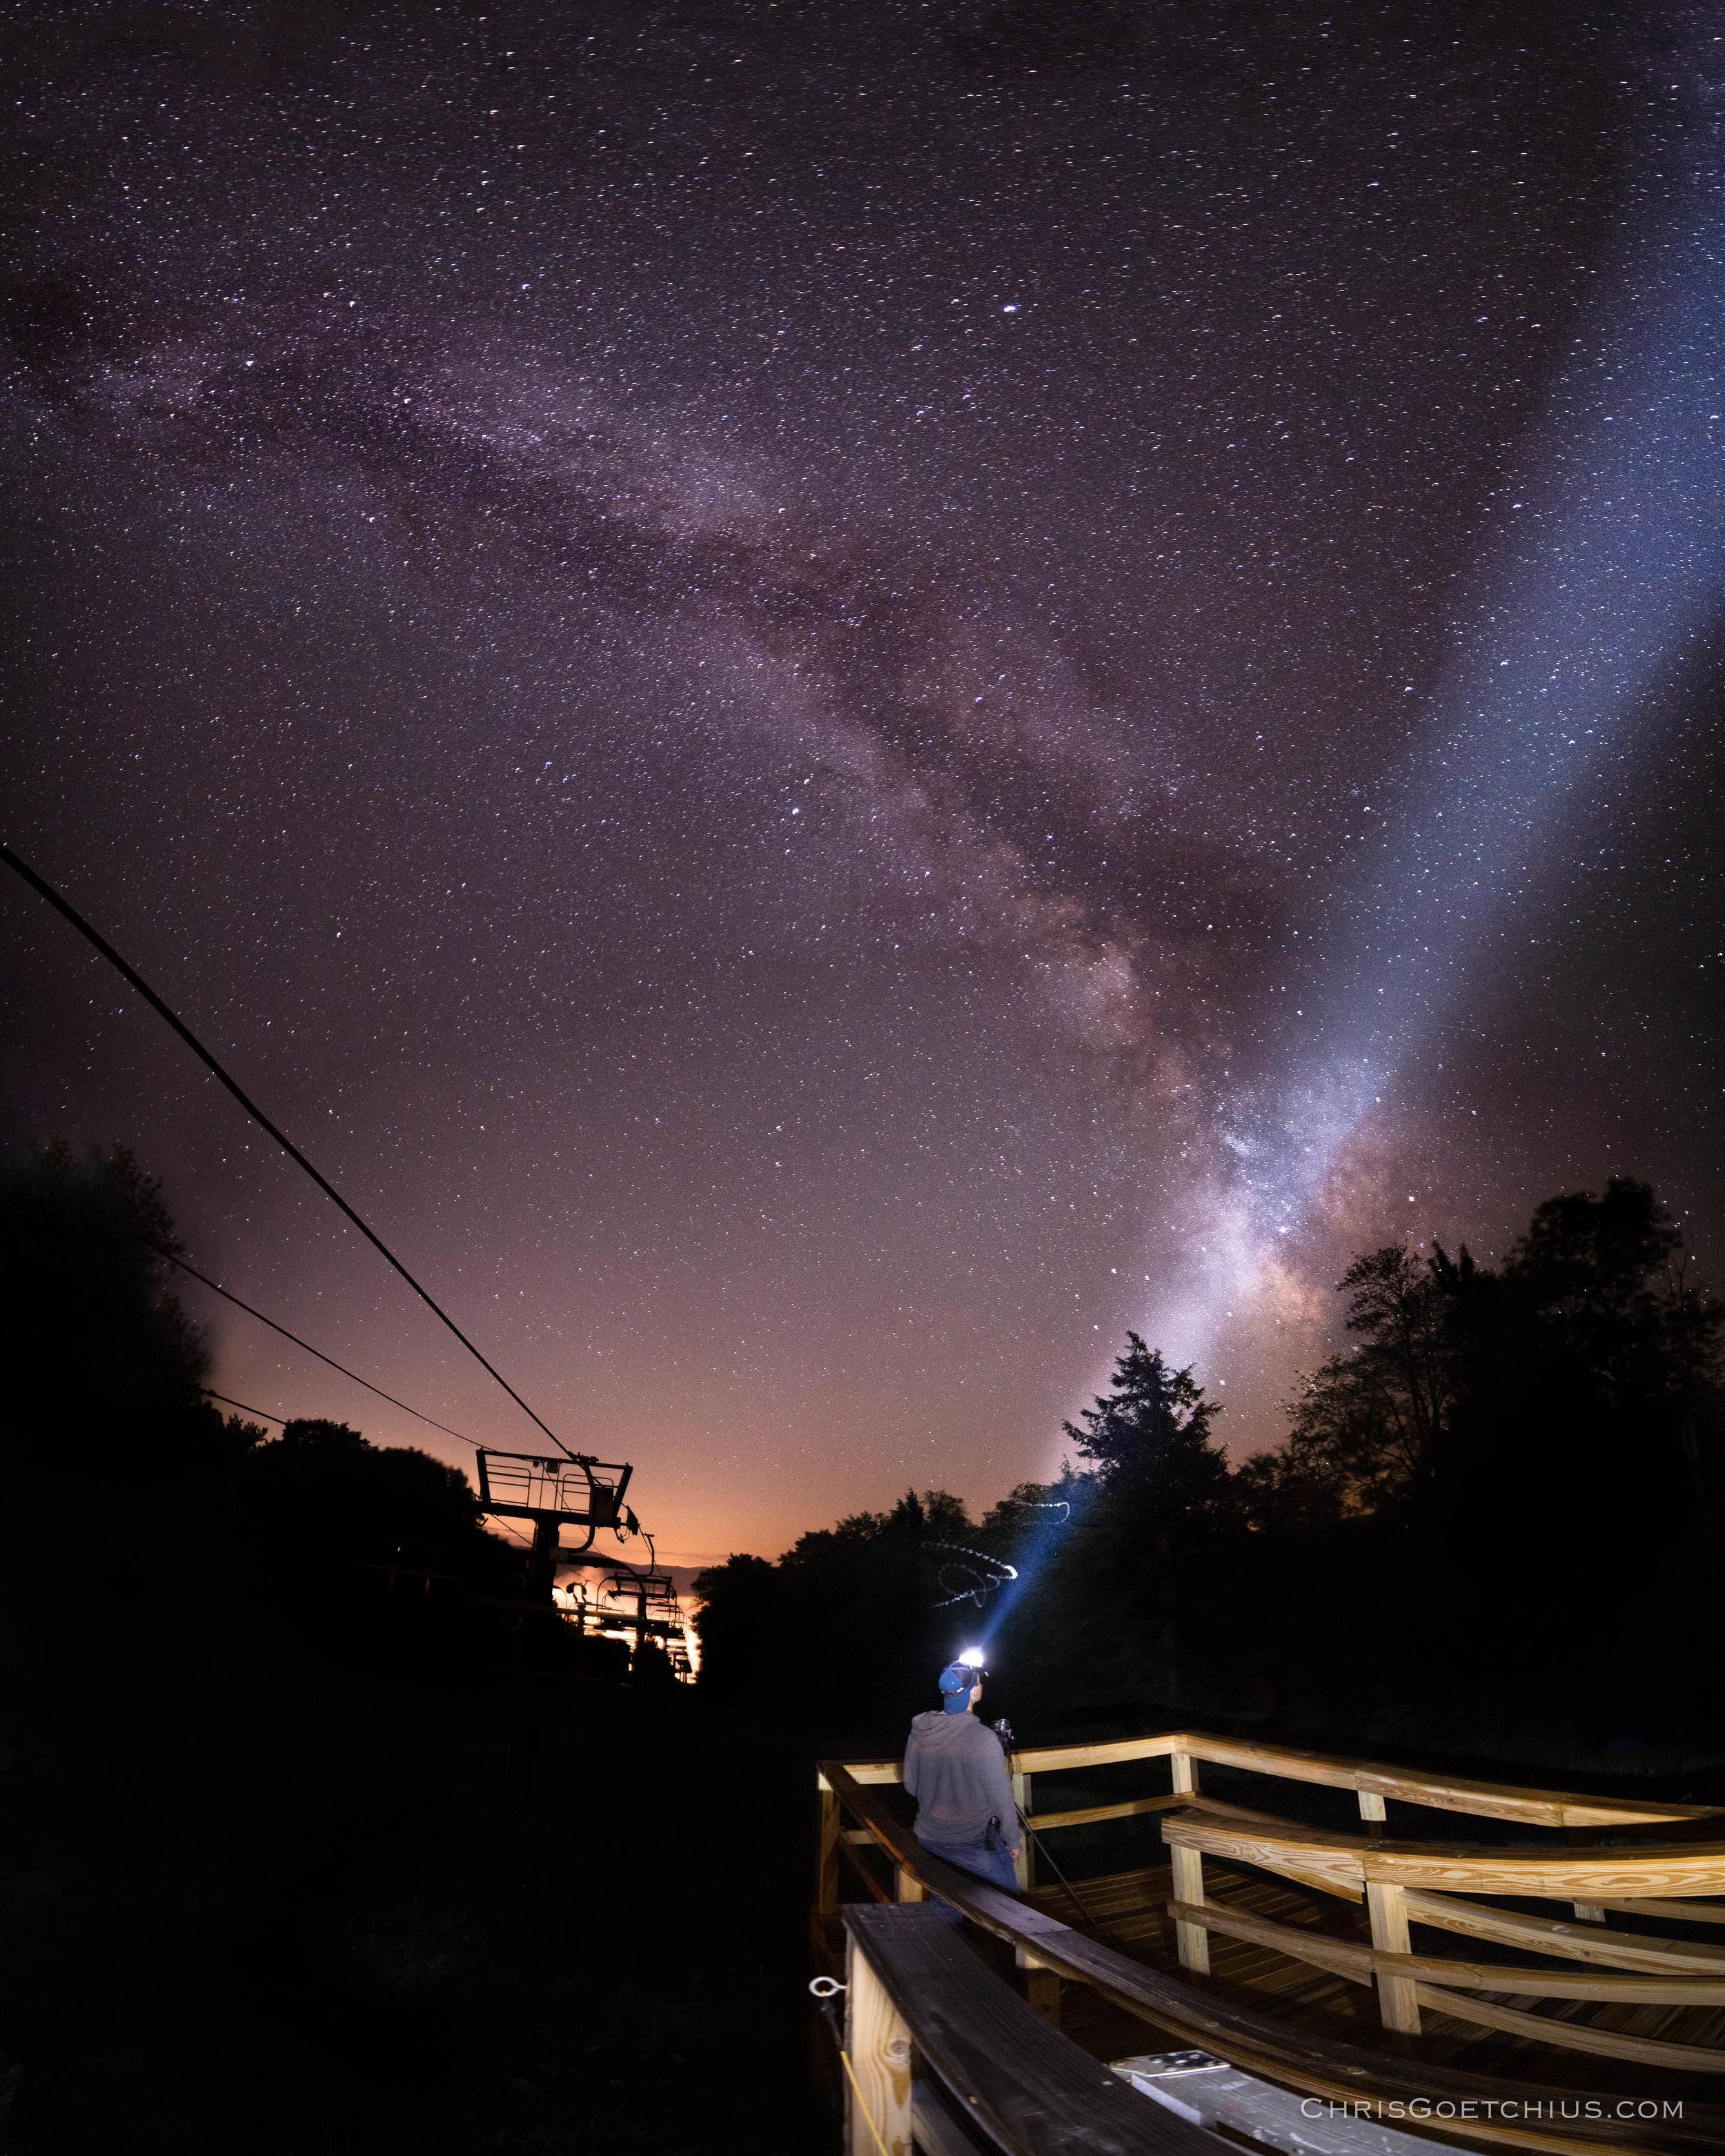 Vermont - 00112_ME_ME - Chris Goetchius 2017.jpg